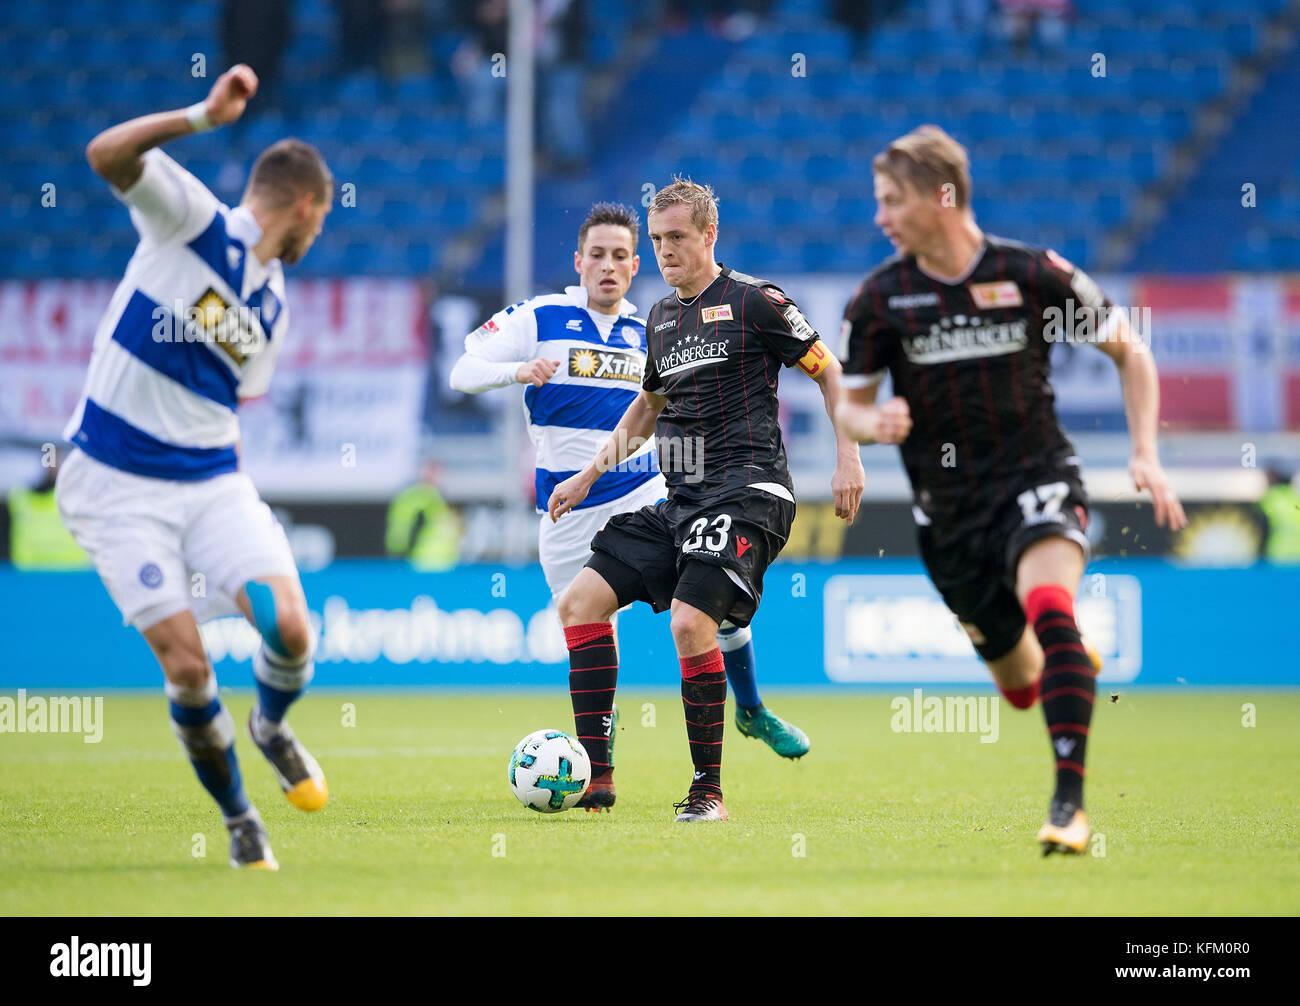 Duisburg, Deutschland. 29th Oct, 2017. Spielszene with Felix KROOS (Union/ withte), Aktion, Fussball . Bundesliga, - Stock Image